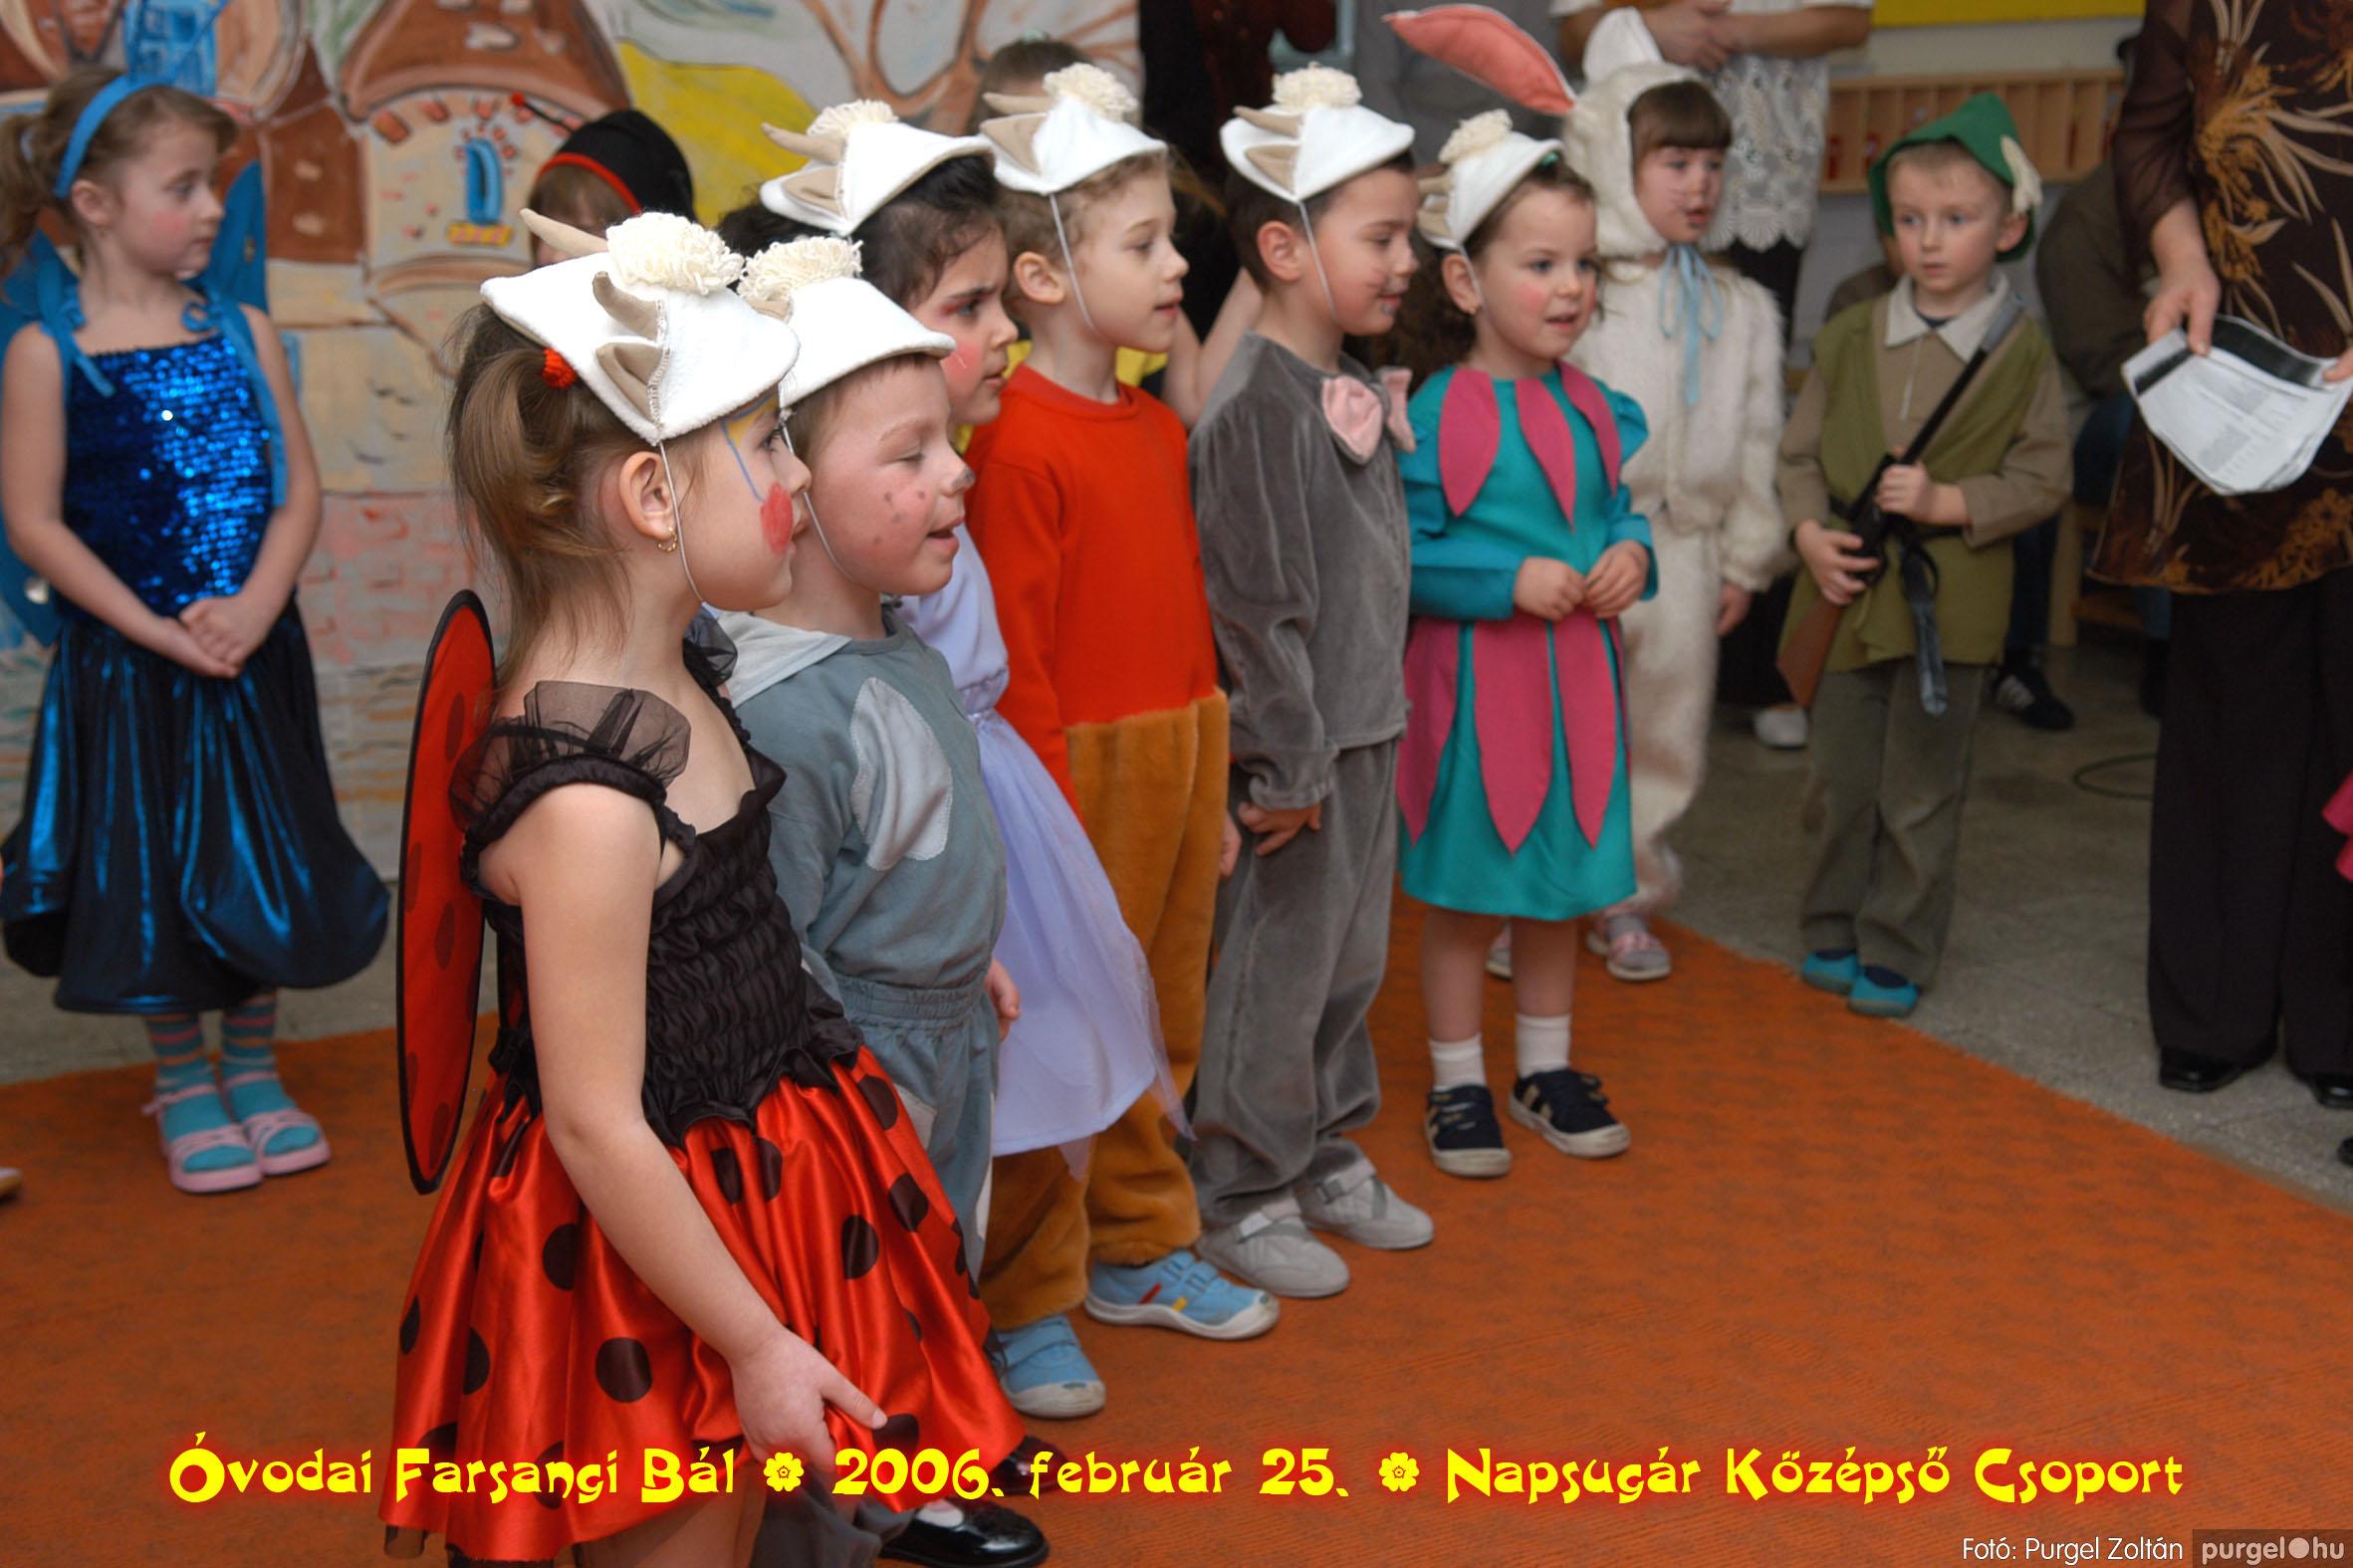 2006.02.25. 221 Kurca-parti Óvoda farsang 2006. - Napsugár csoport - Fotó:PURGEL ZOLTÁN©.jpg